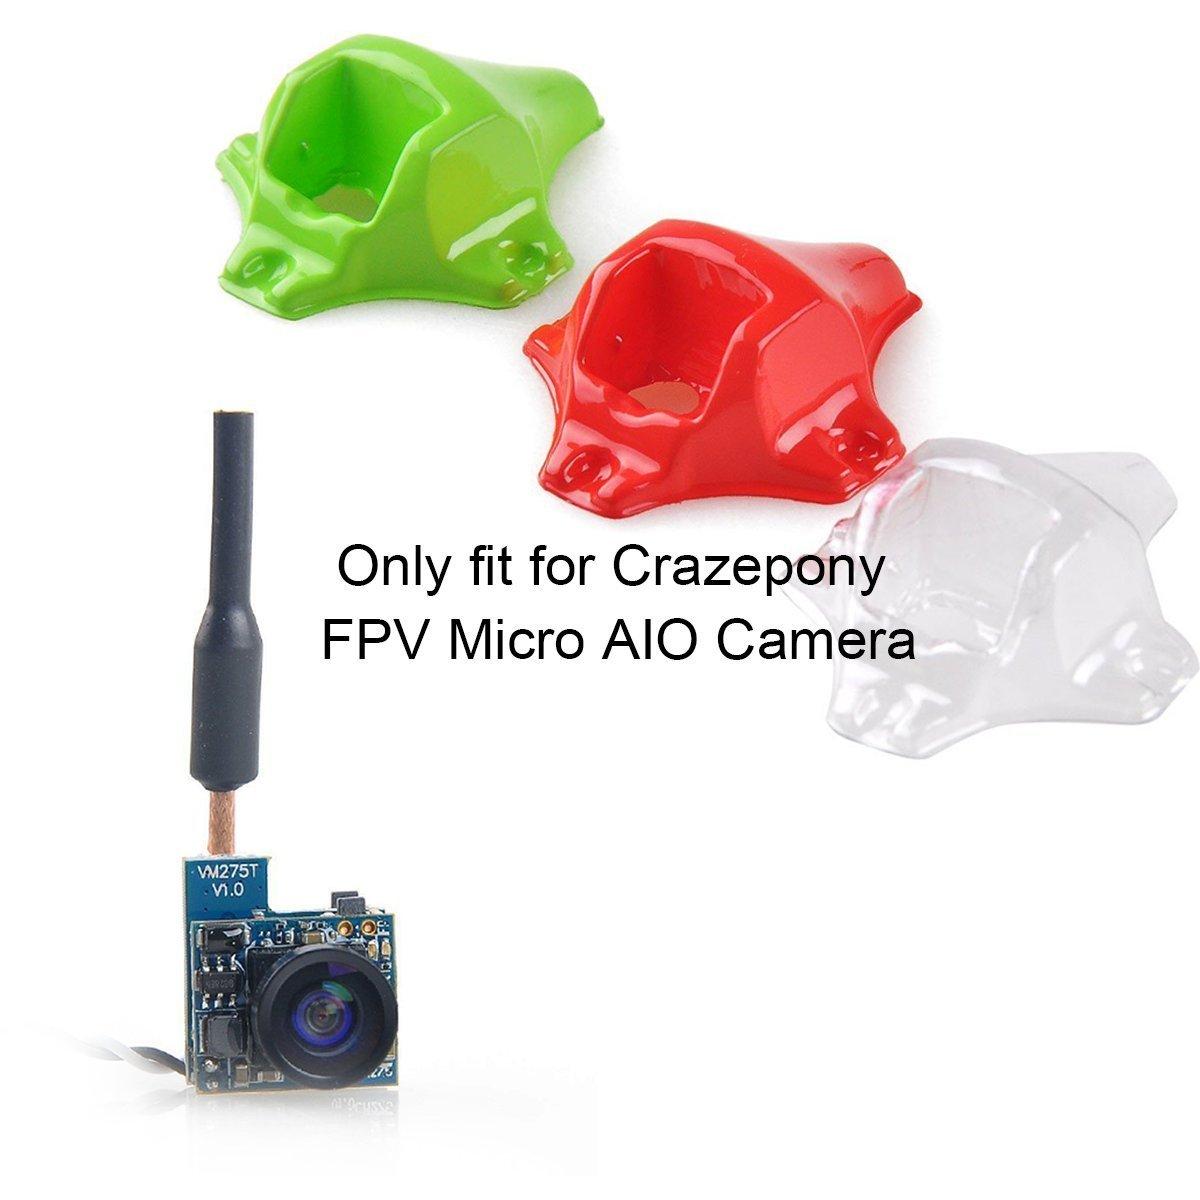 Crazepony 3pcs F04 FPV Camera Canopy Mount Tiny Whoop for Crazepony FPV Micro AIO Camera  sc 1 st  Rc-Drones.com & 3pcs F04 FPV Camera Canopy Mount Tiny Whoop for Crazepony FPV ...